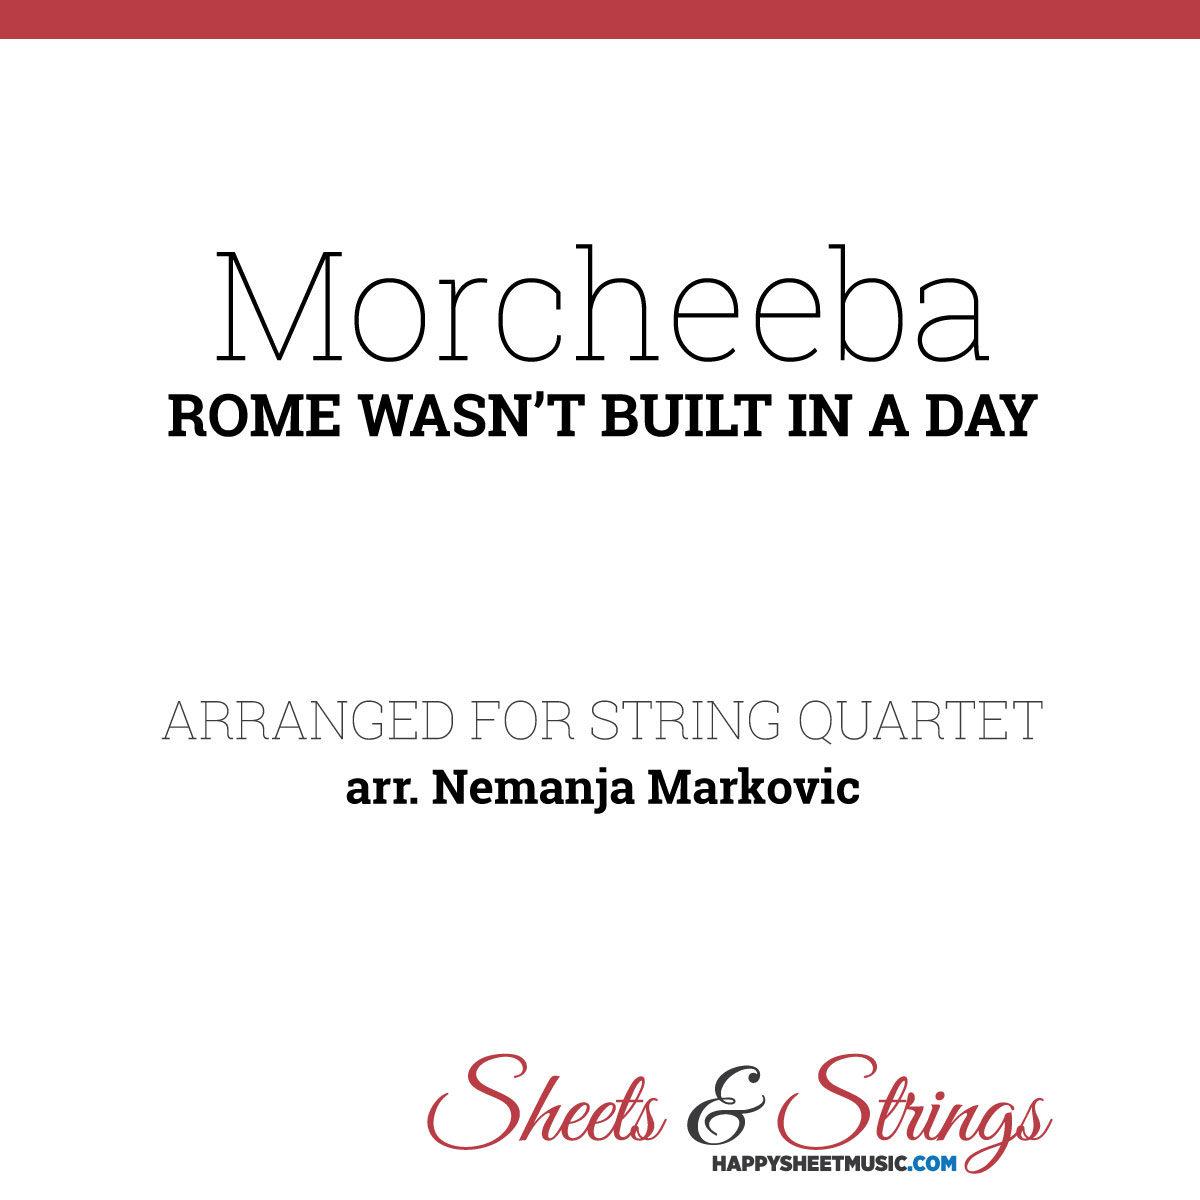 Morcheeba - Rome Wasn't Built In A Day - Sheet Music for String Quartet - Music Arrangement for String Quartet